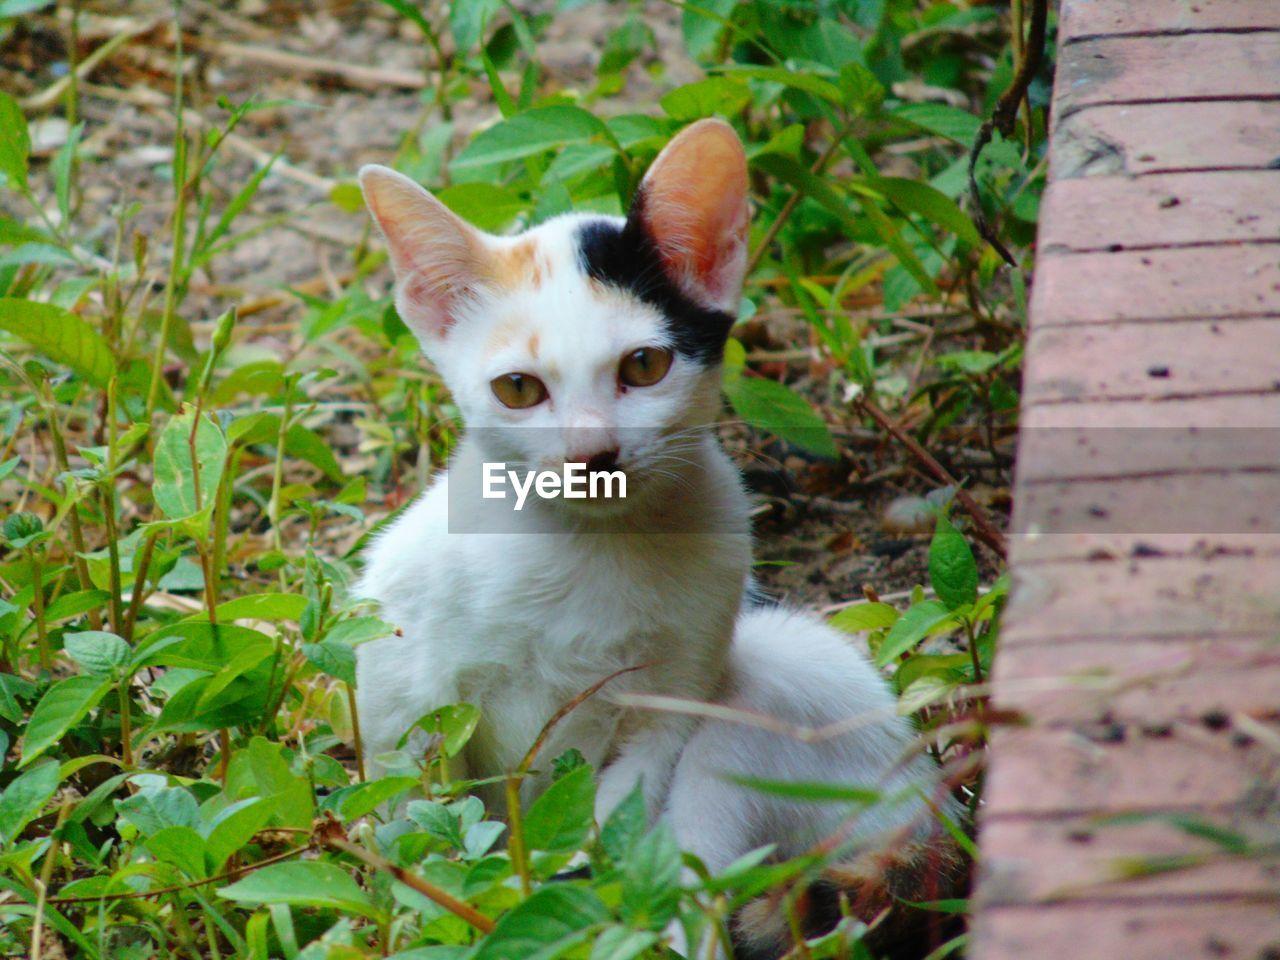 CLOSE-UP PORTRAIT OF CAT SITTING ON PLANT